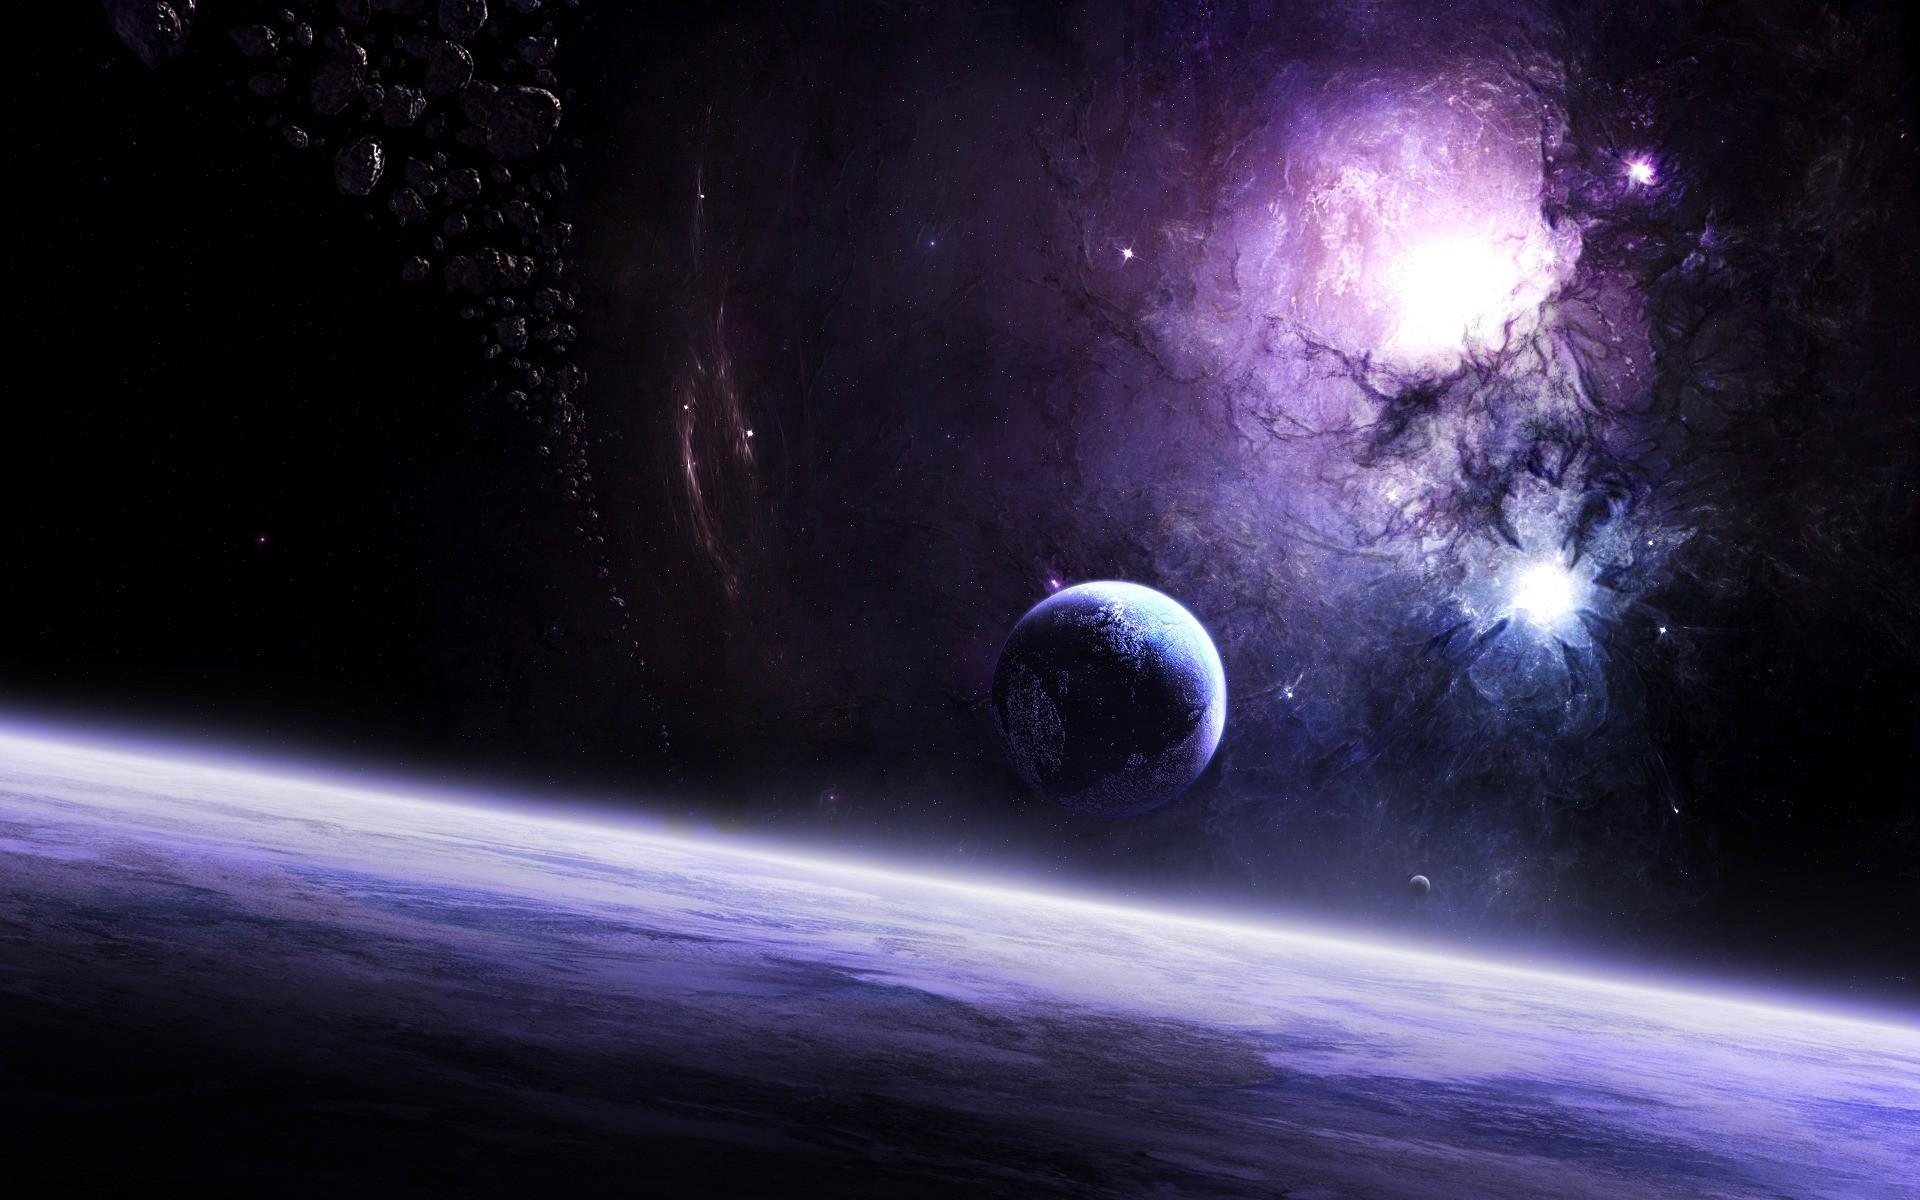 планета, спутник, новая